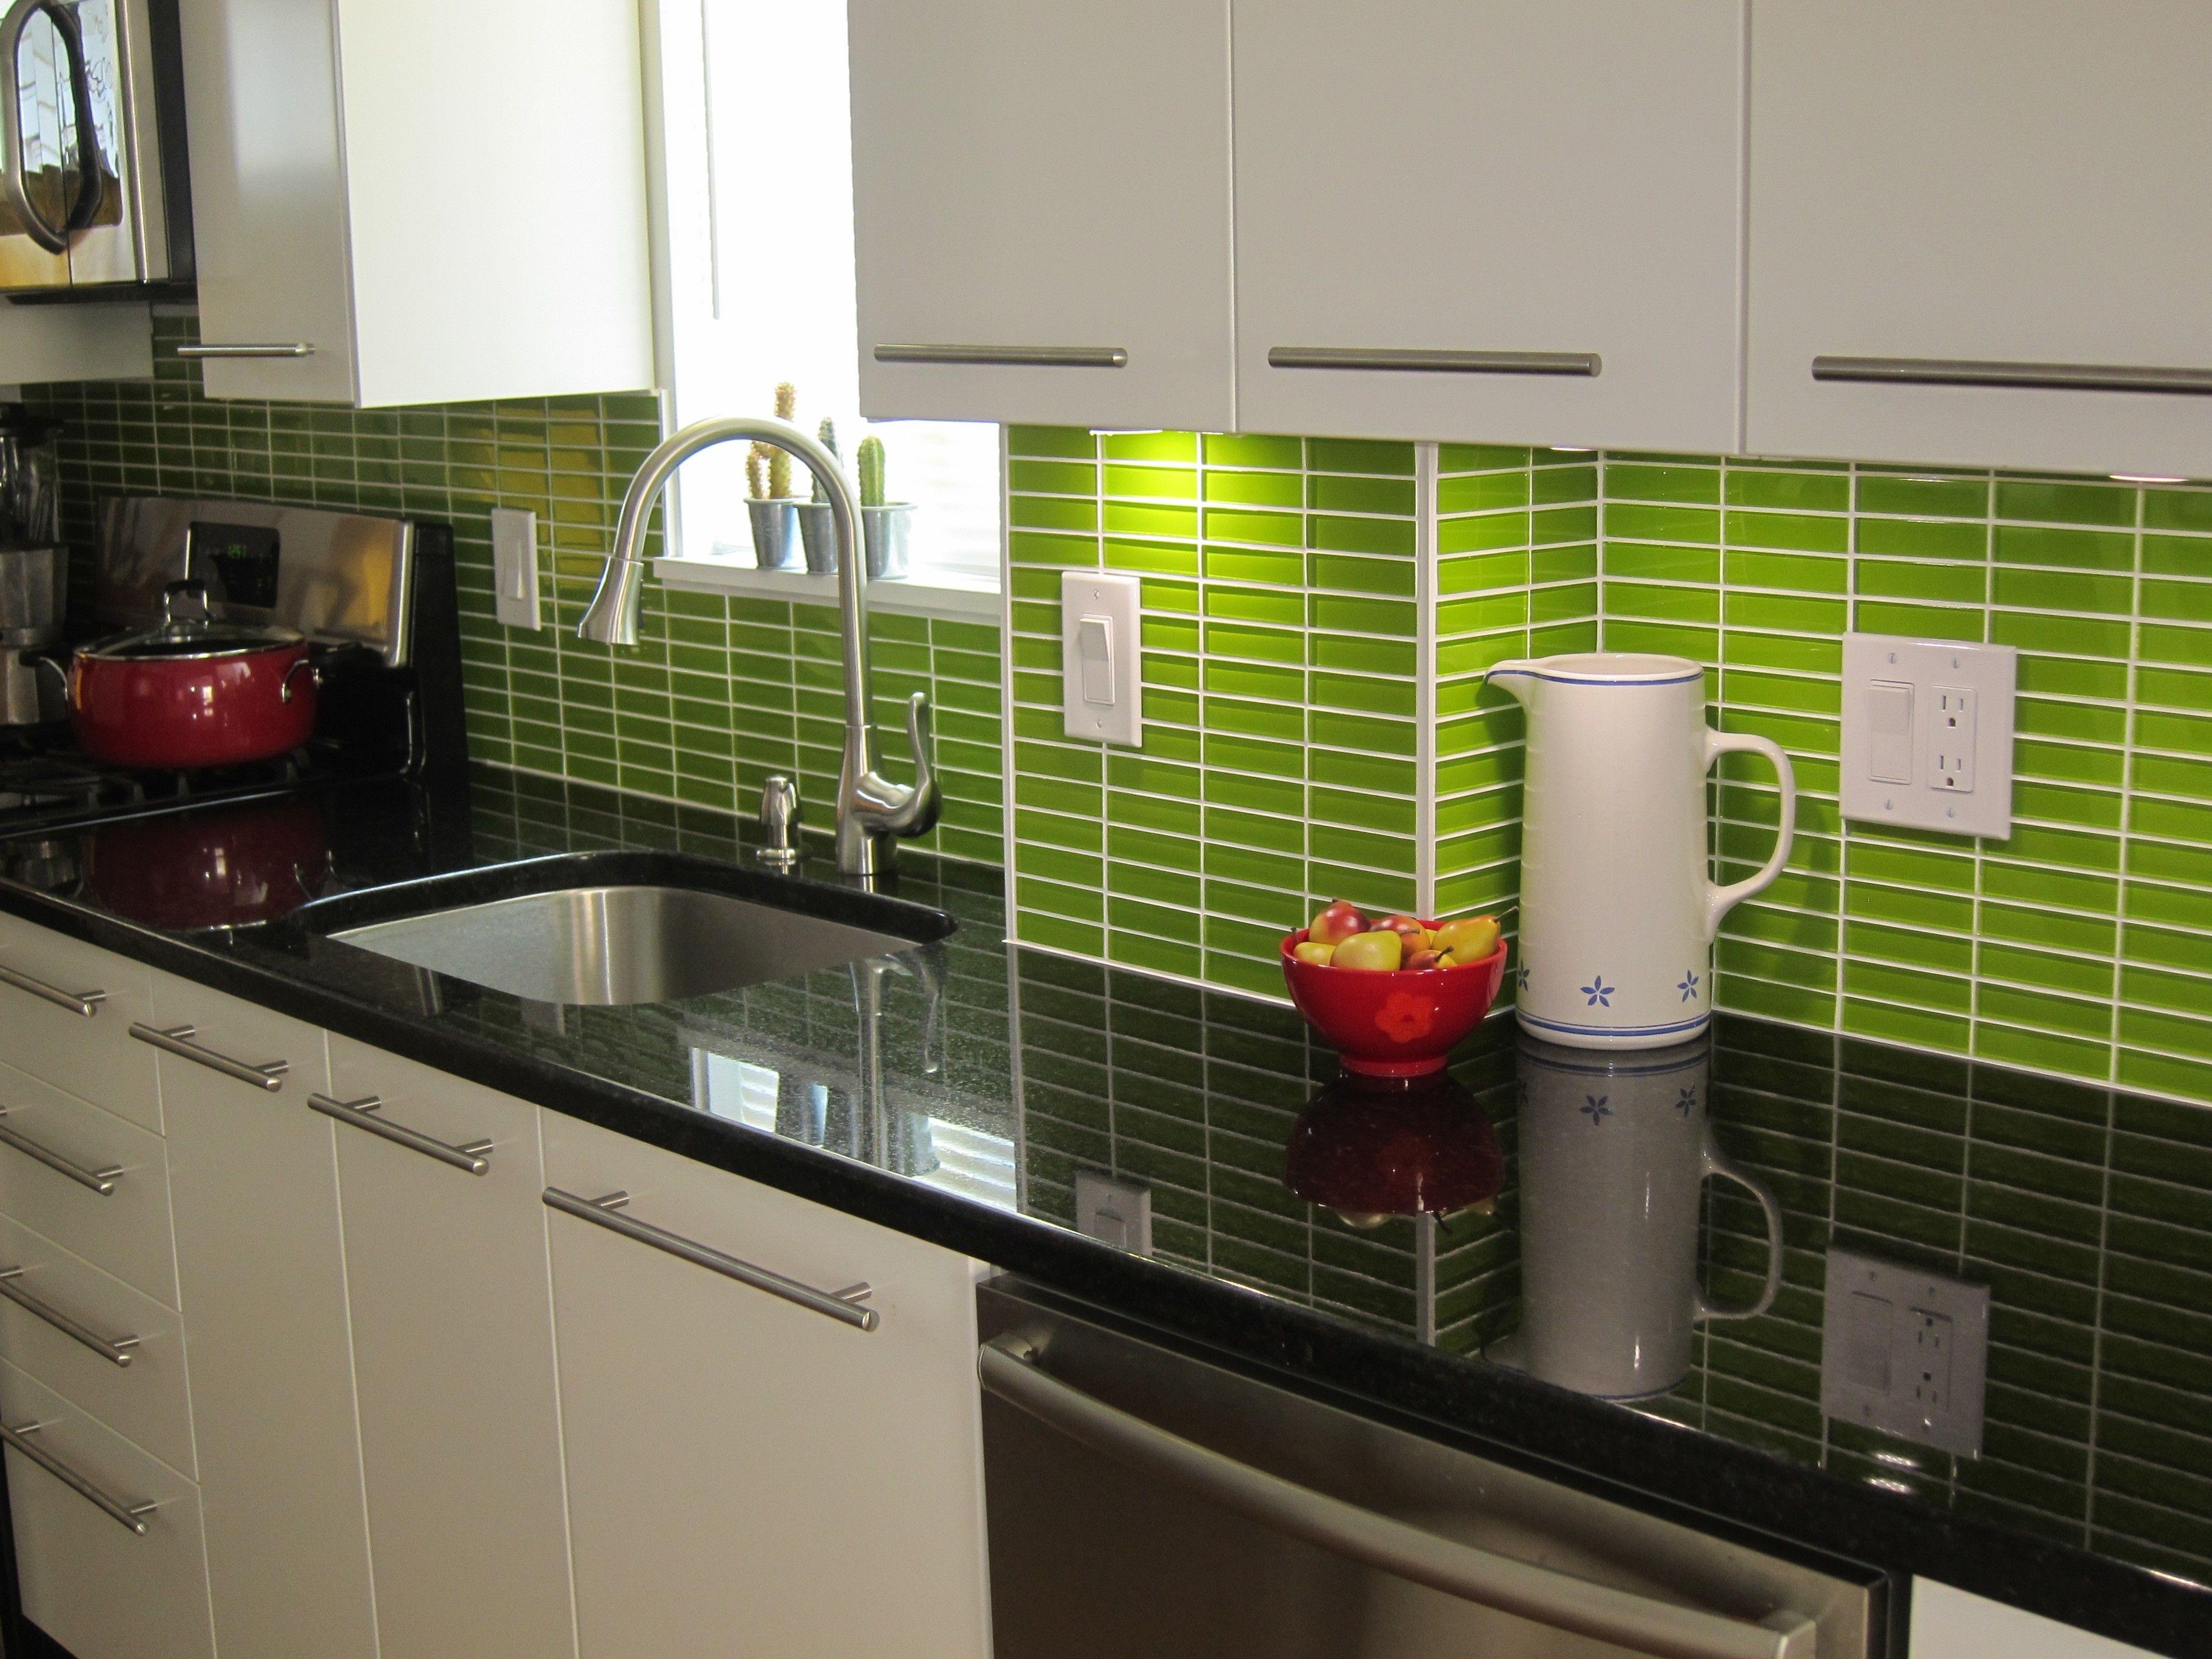 Extraordinary Green Backsplash Tile For